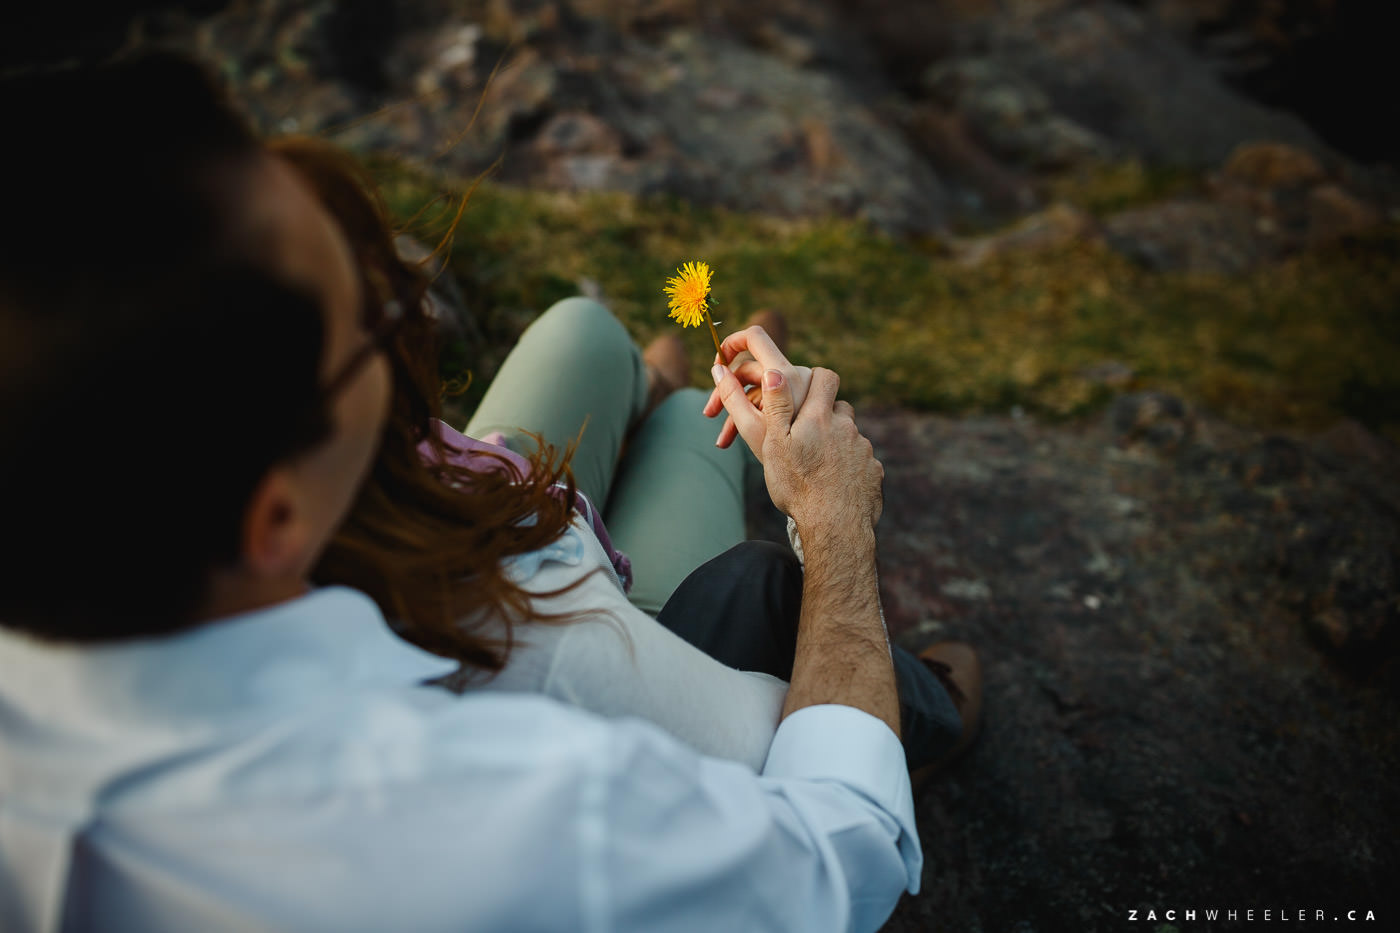 Kim-Dan-Engagement-Photography-StJohns-Newfoundland-8